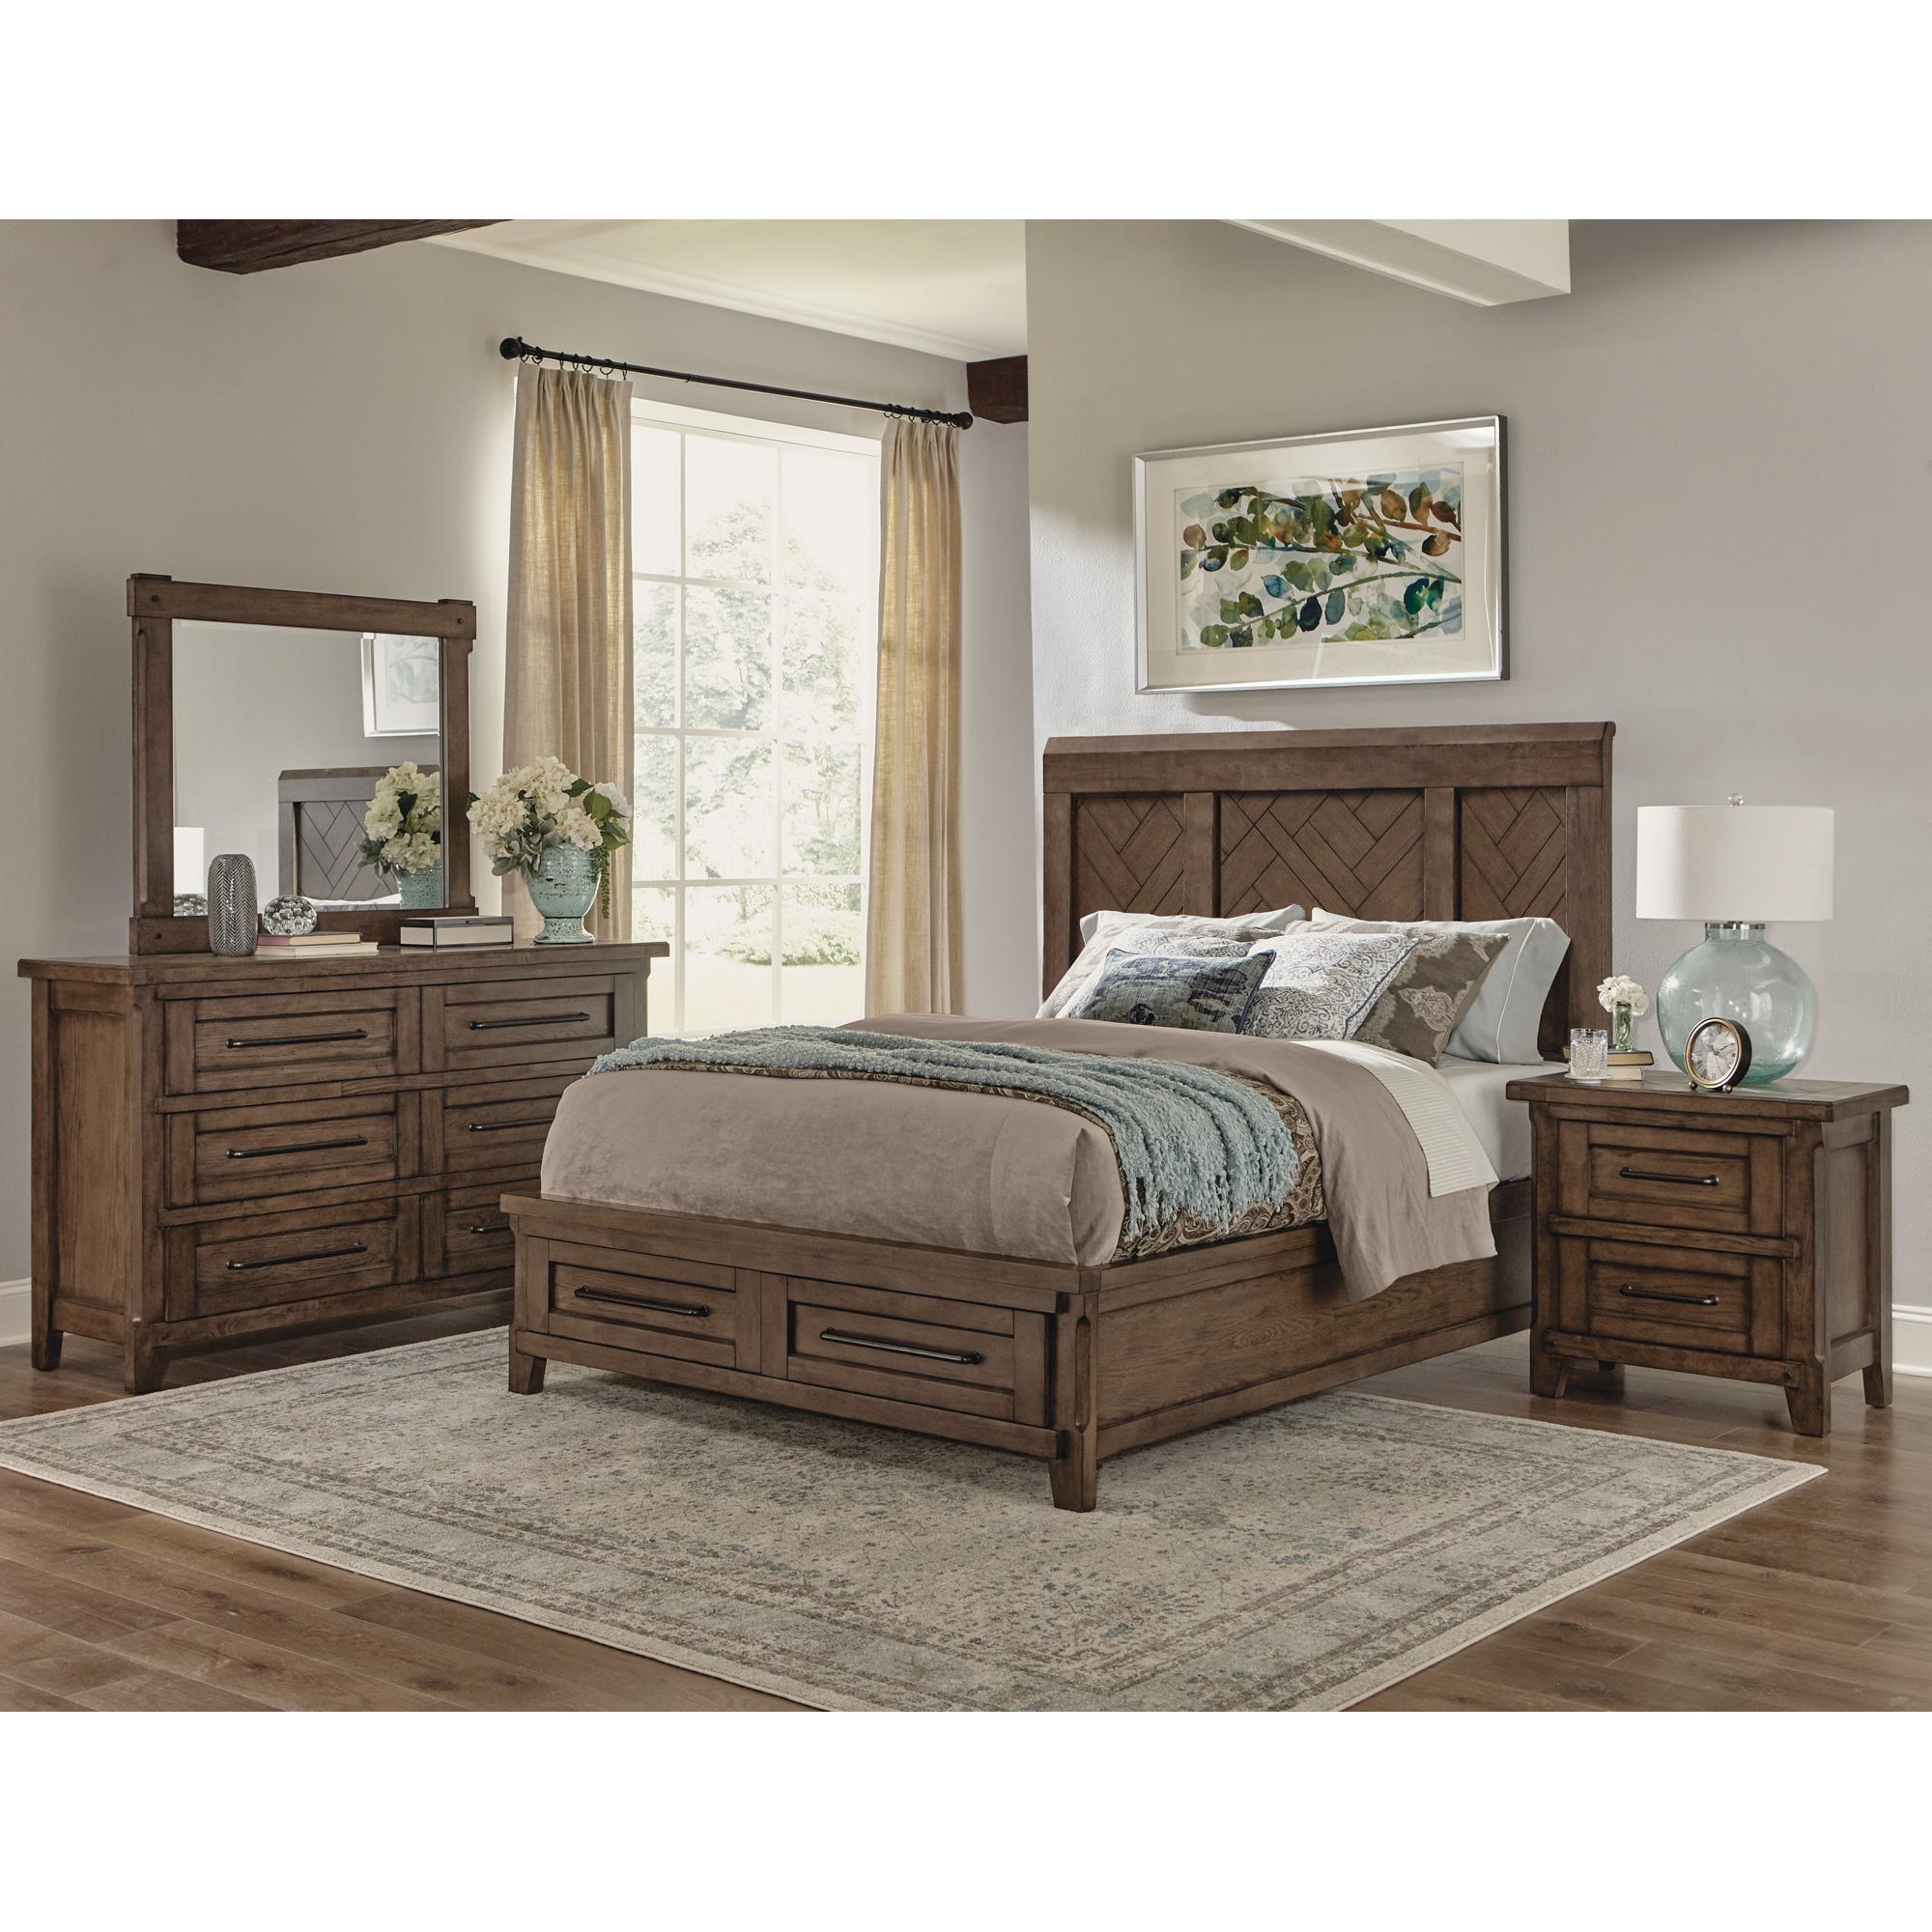 Davis Direct | Patches Gray Brown Queen Panel Storage 4 Piece Room Group Bedroom Set